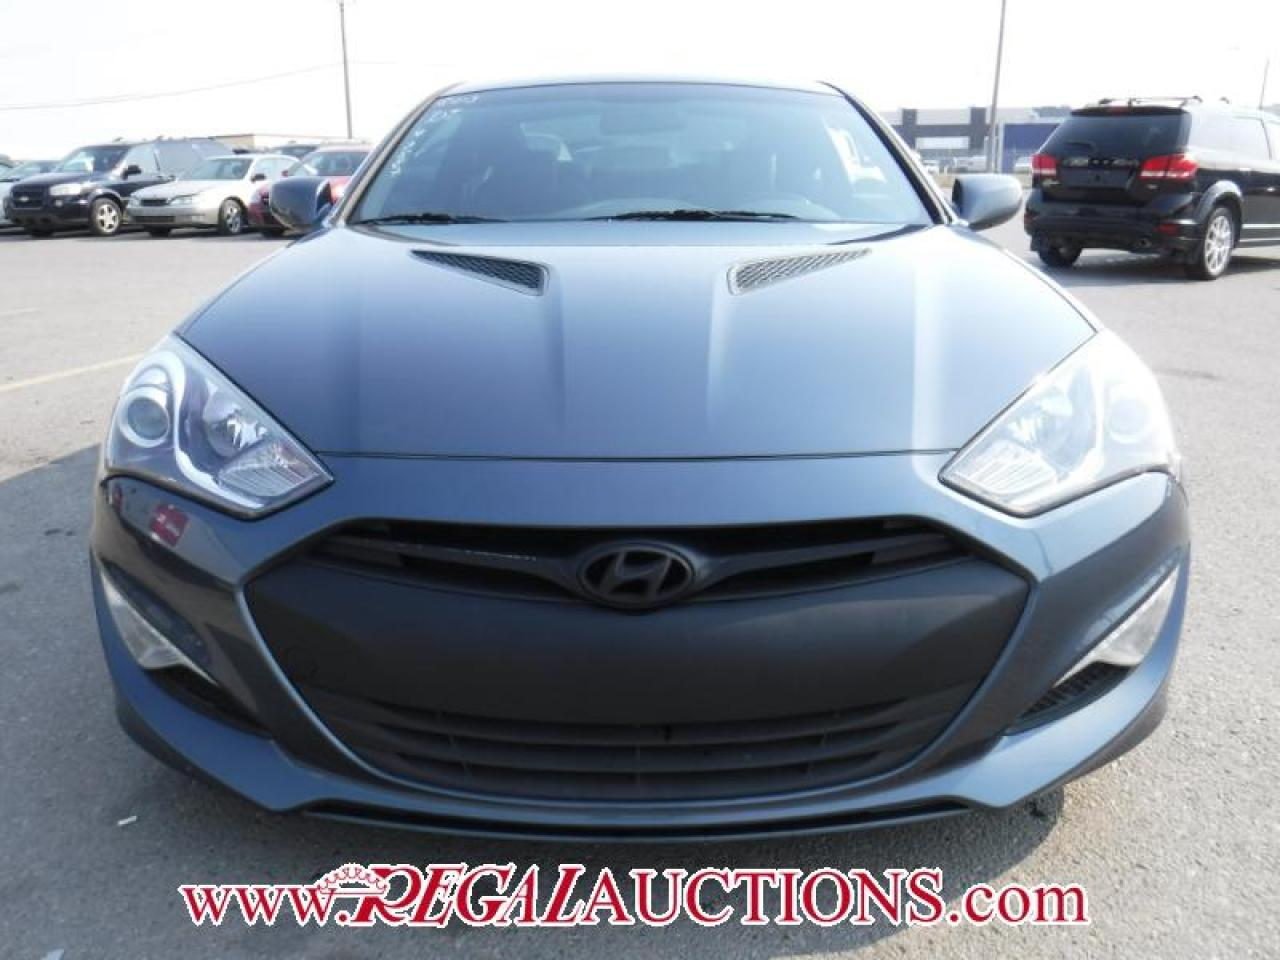 Photo of Blue 2013 Hyundai Genesis Coupe